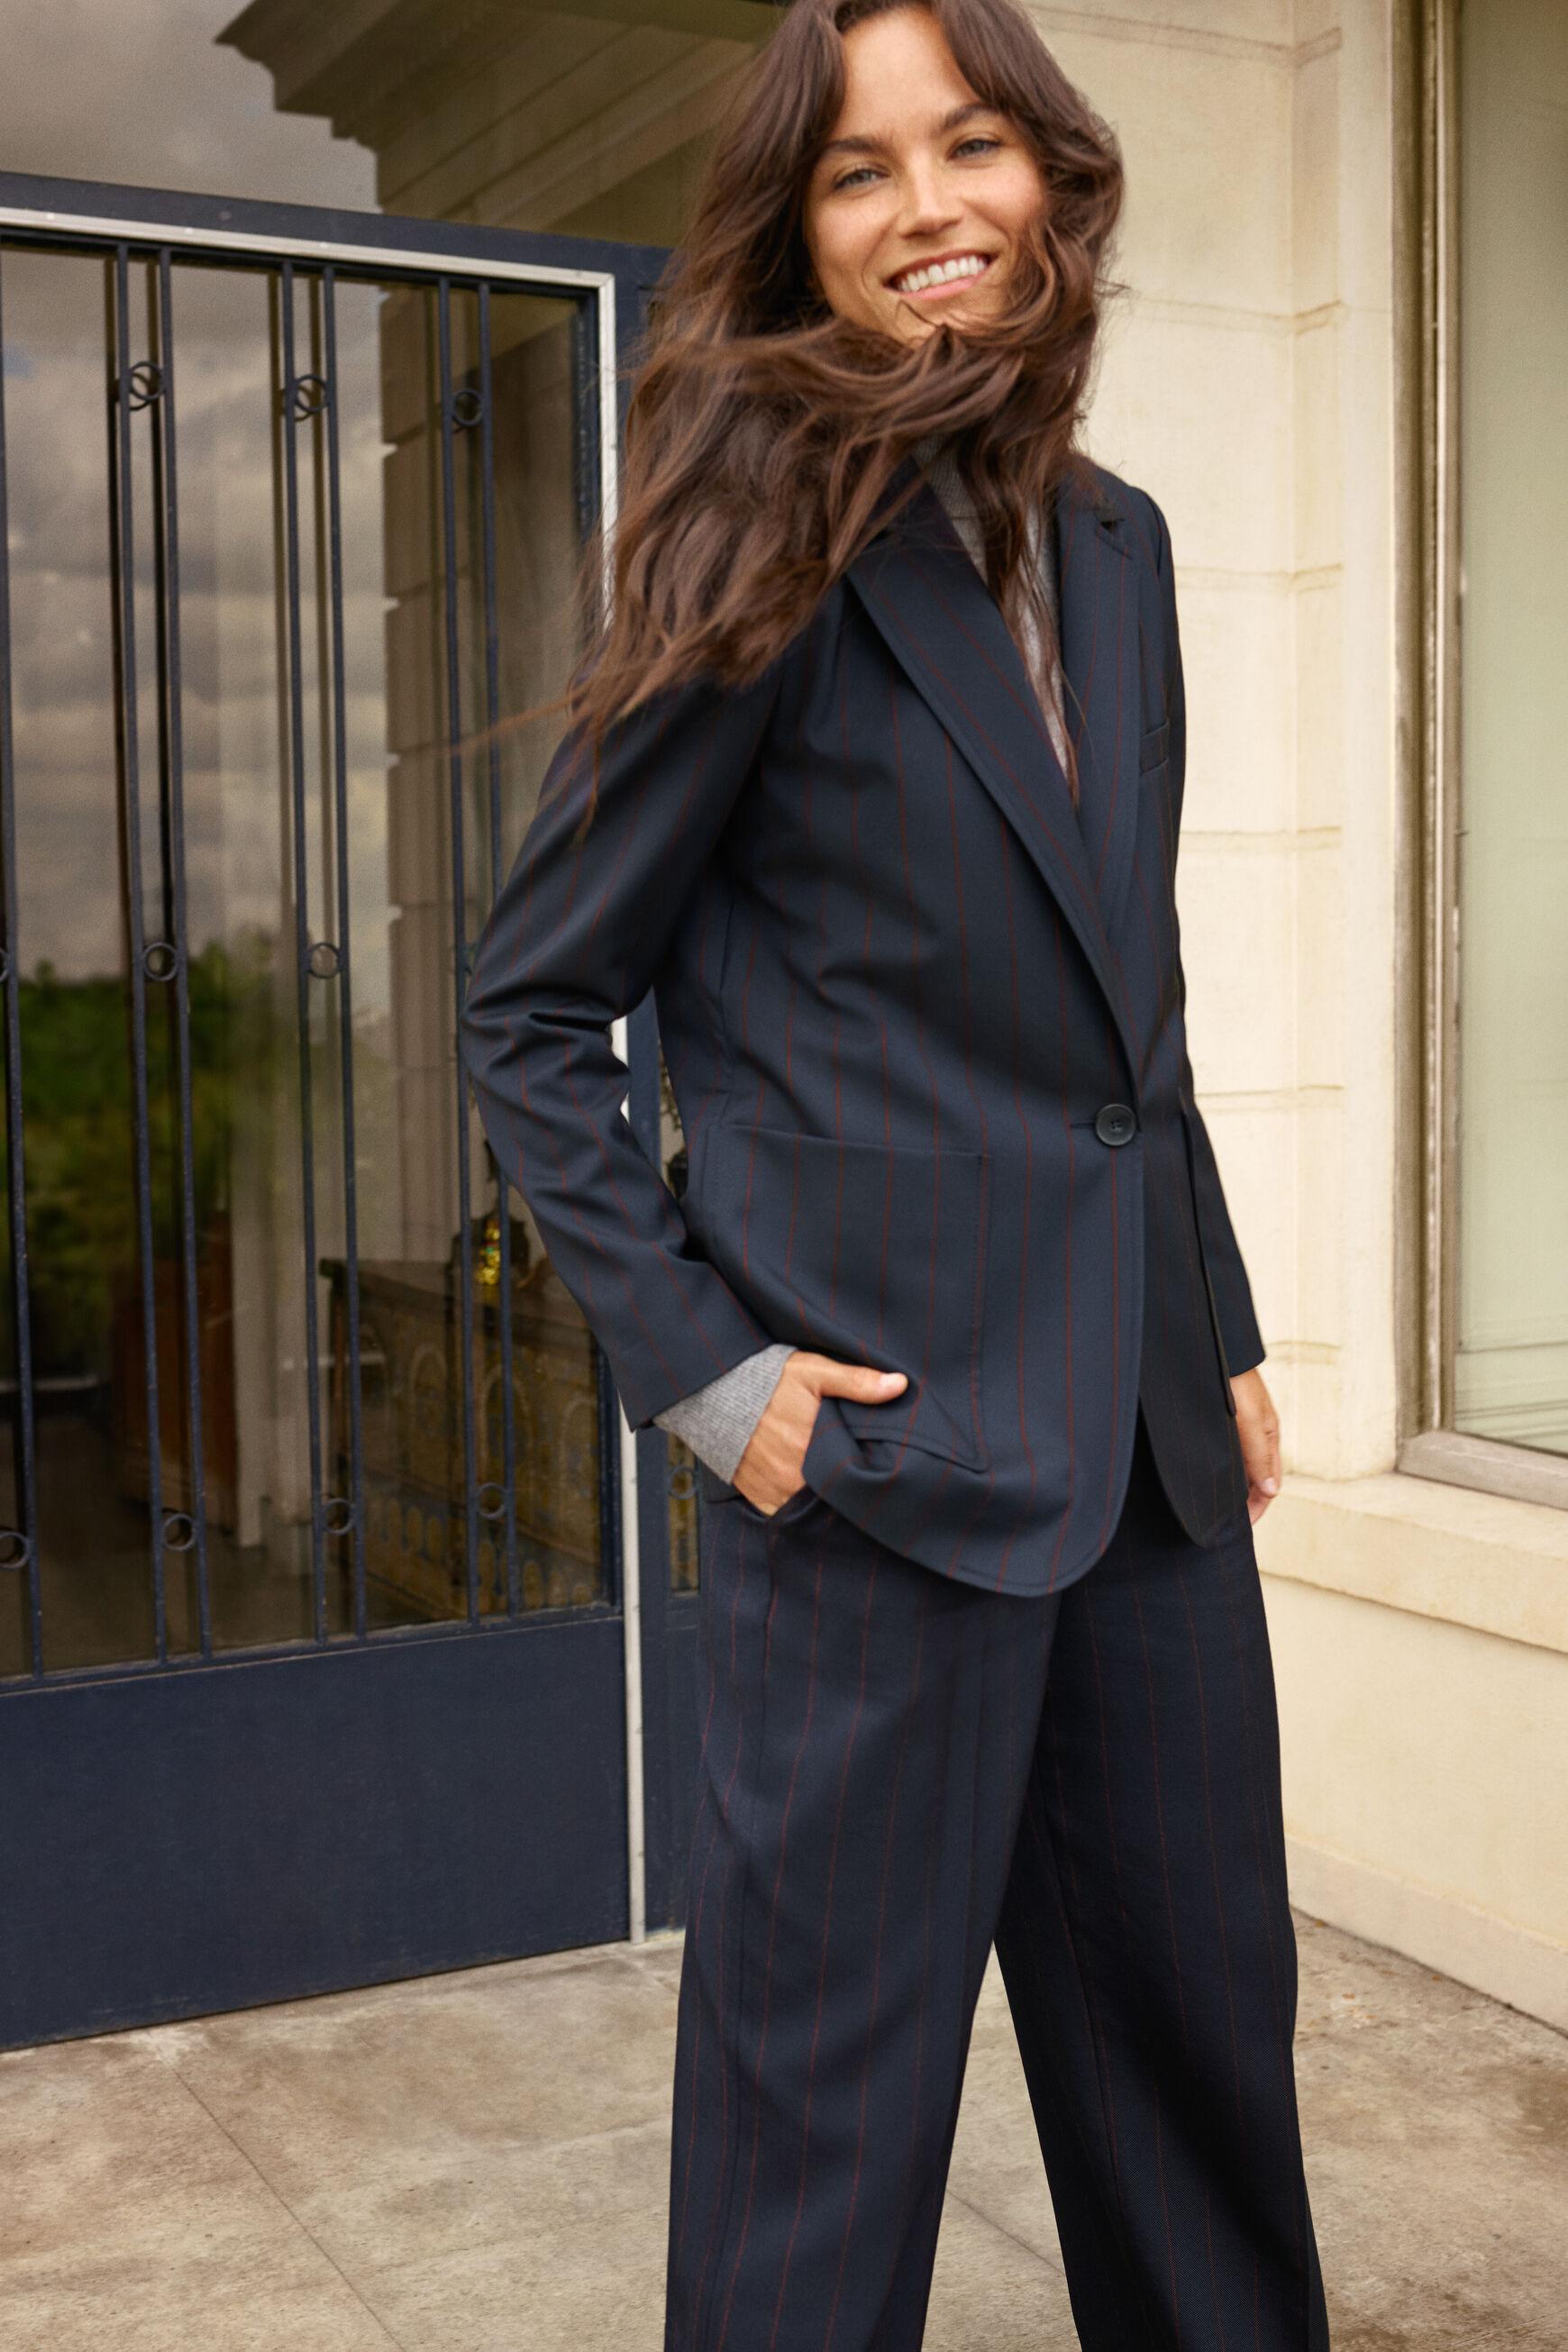 Candid Feitong Fur Coat Winter Women Coats 2019 Faux Fur Parka Jacket Long Trench Winter Warm Tops Overcoat Womens Fur Coat Faux Fur Women's Clothing